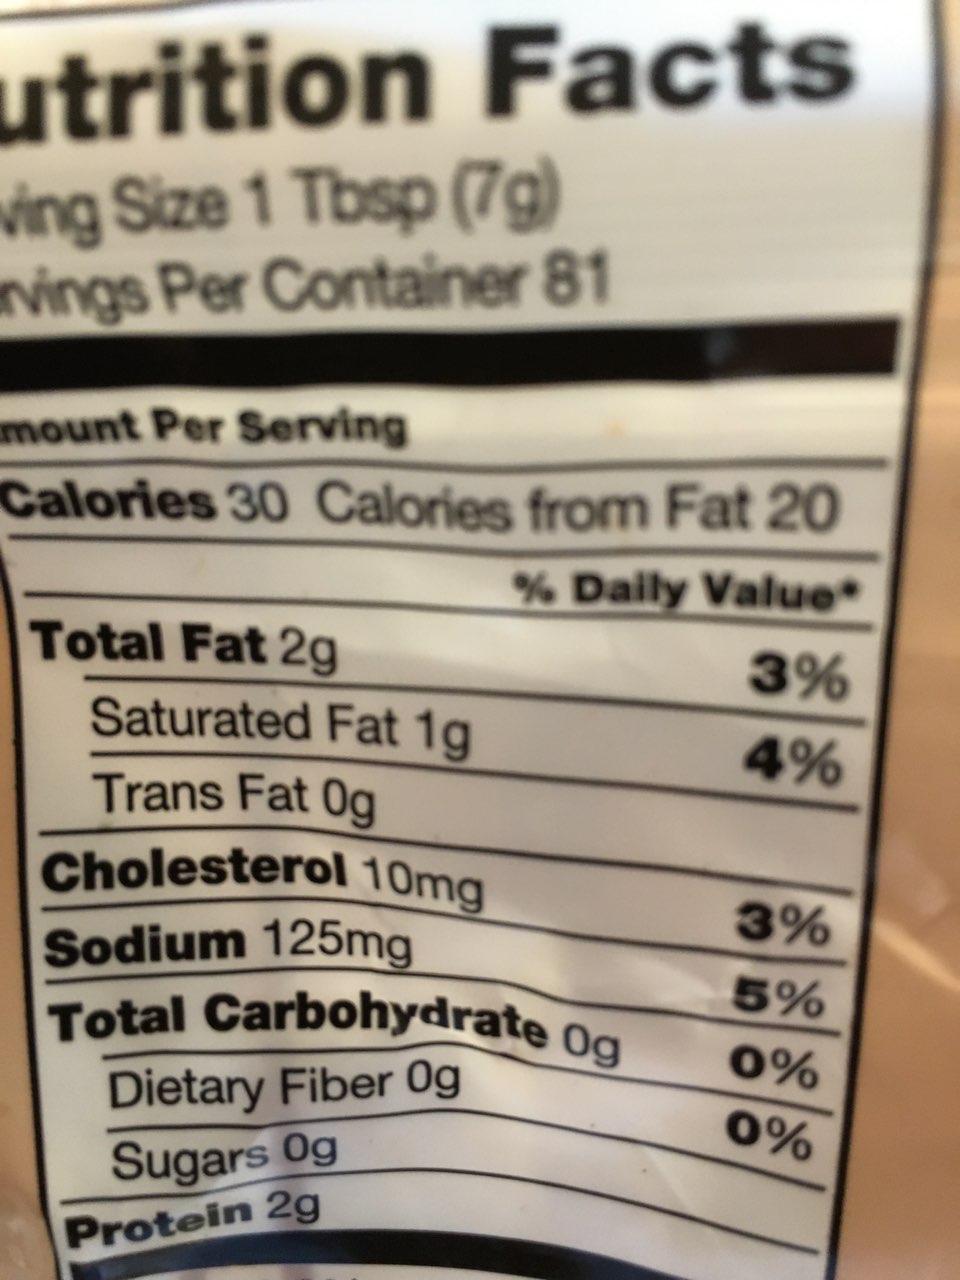 kirkland signature crumbled bacon: calories, nutrition analysis